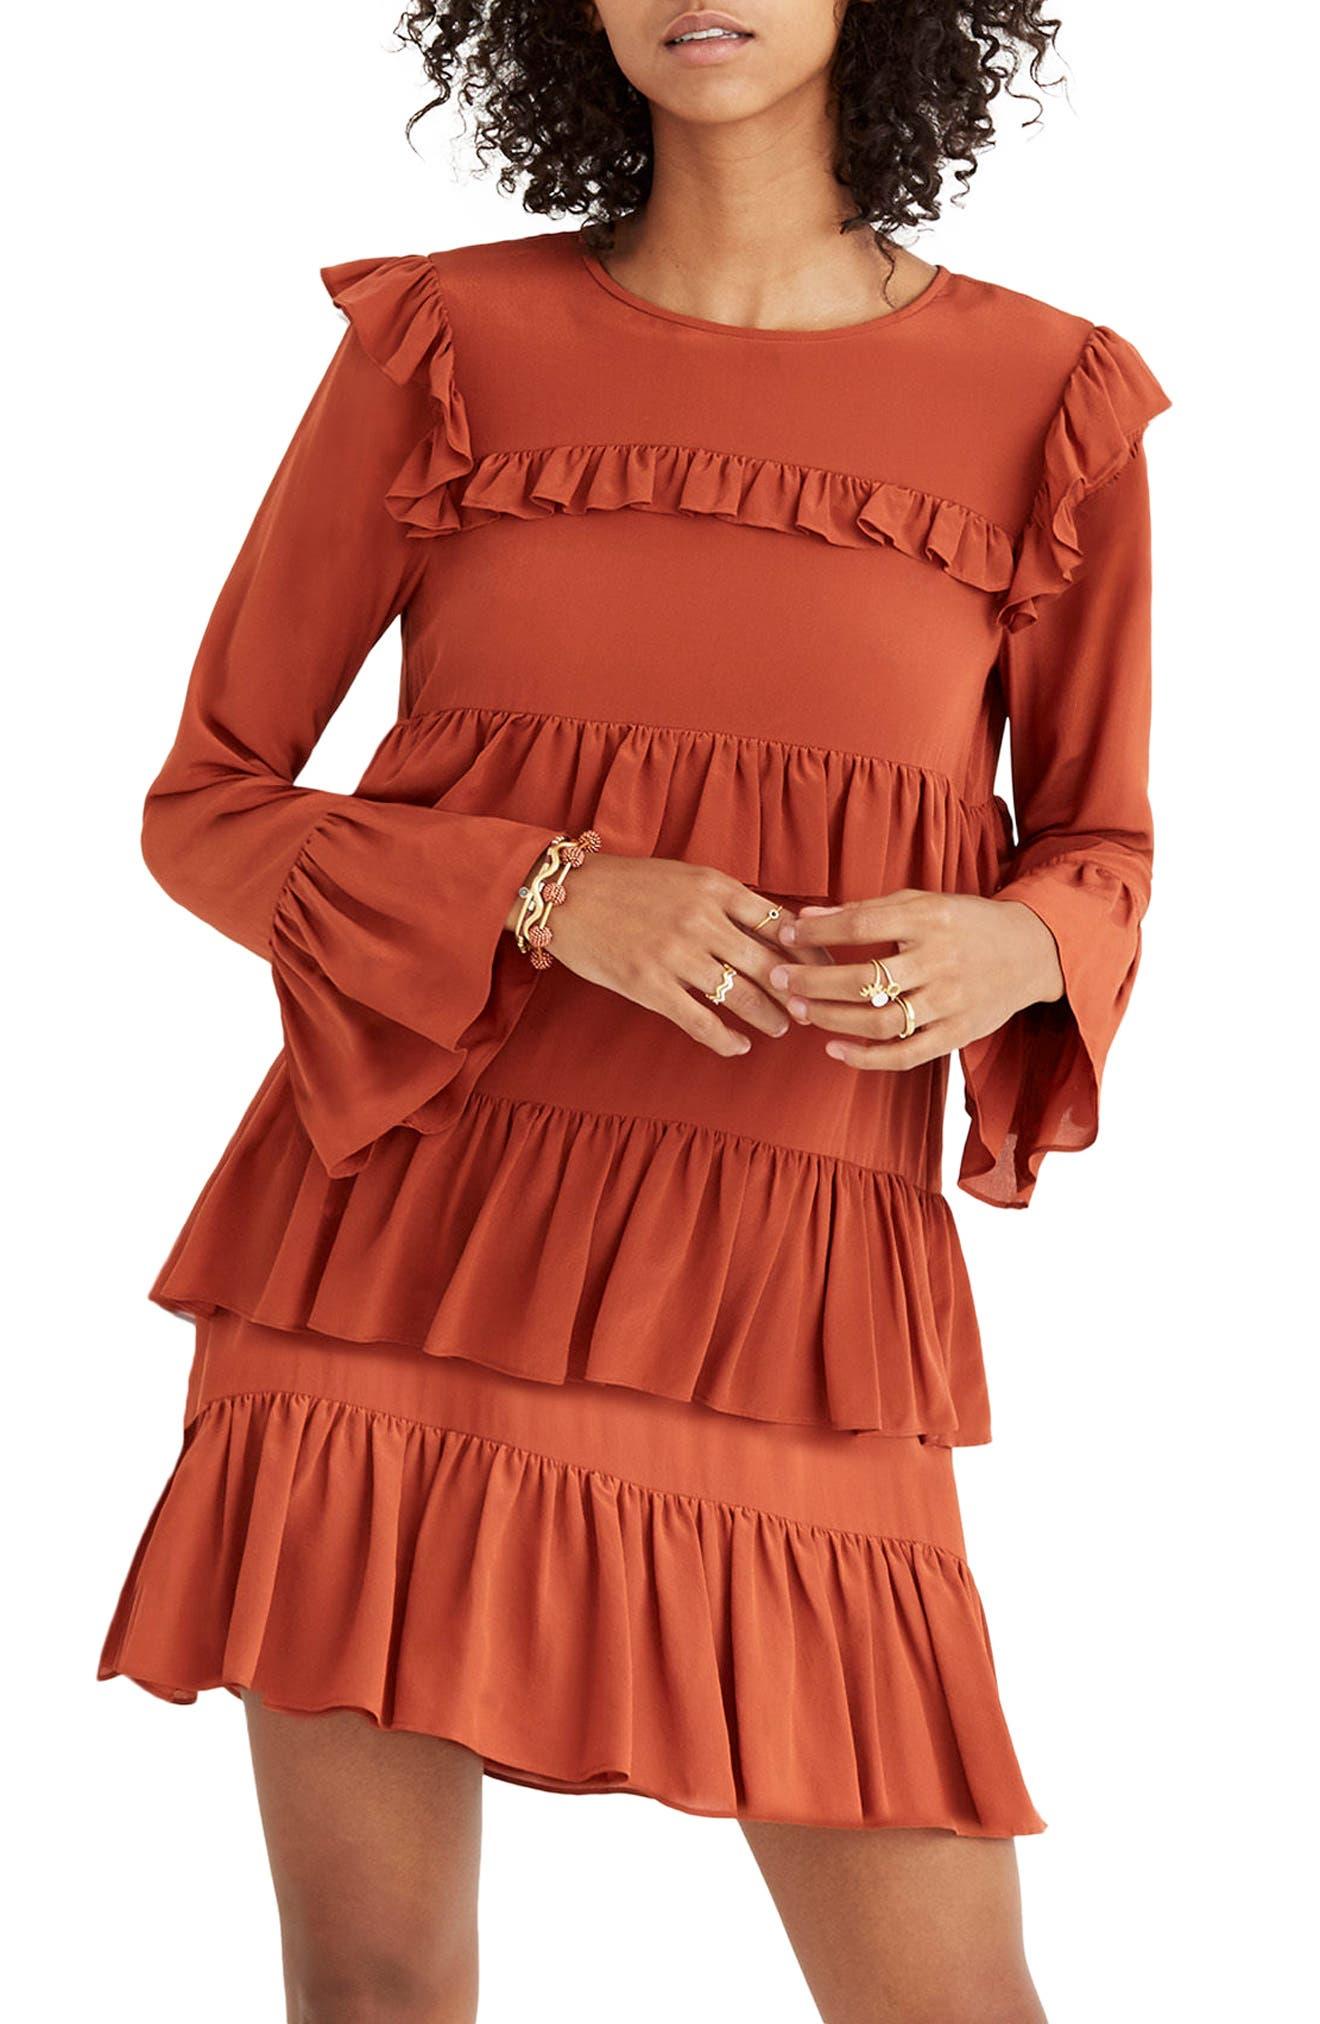 Waterlily Ruffle Dress,                             Main thumbnail 1, color,